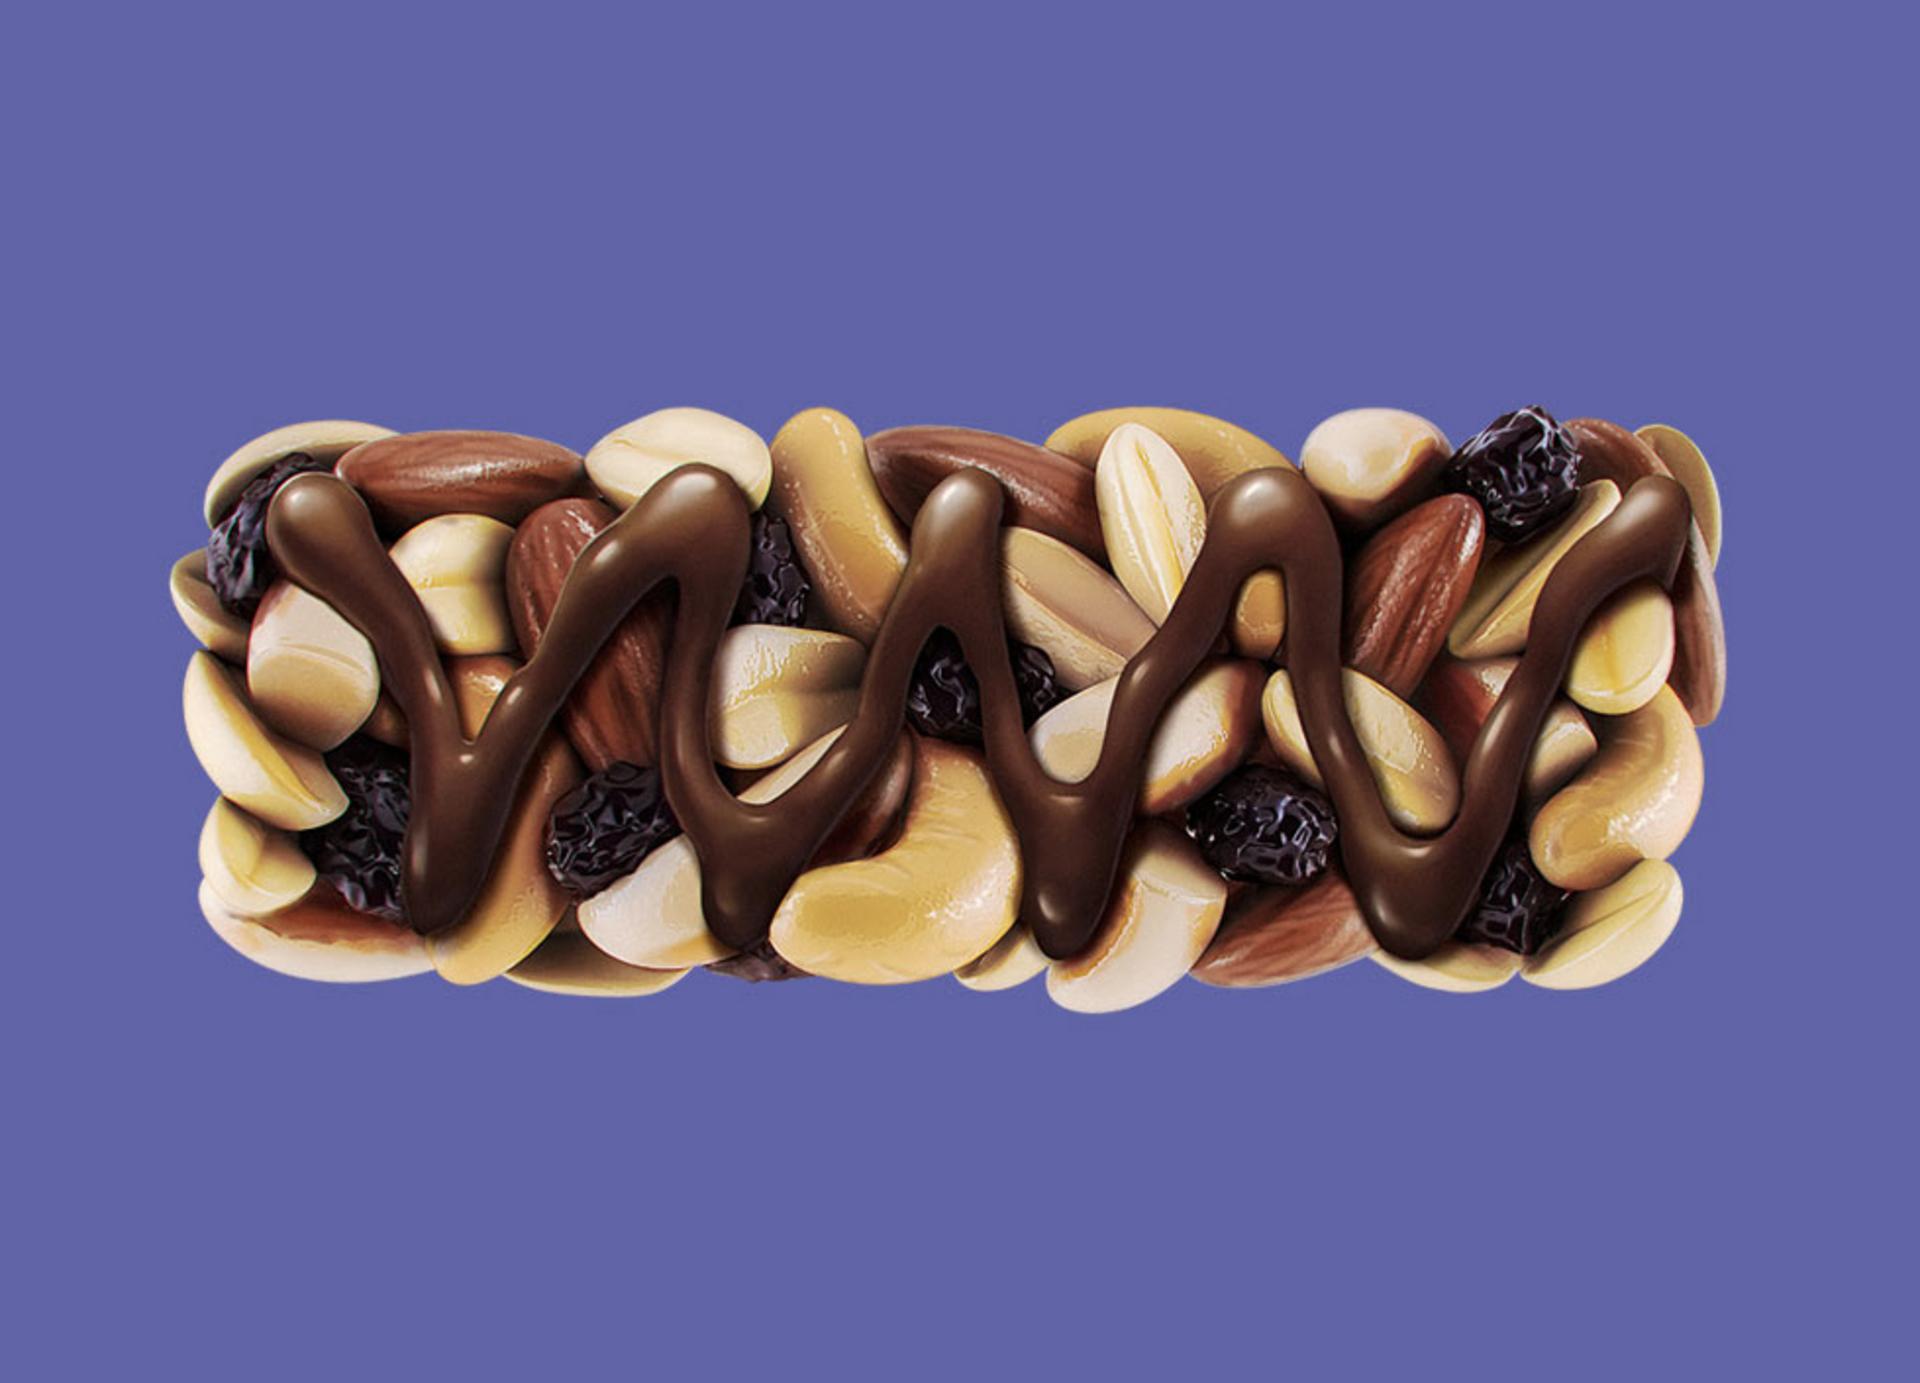 3D Chocolate Fruit and Nut Bar Illustration